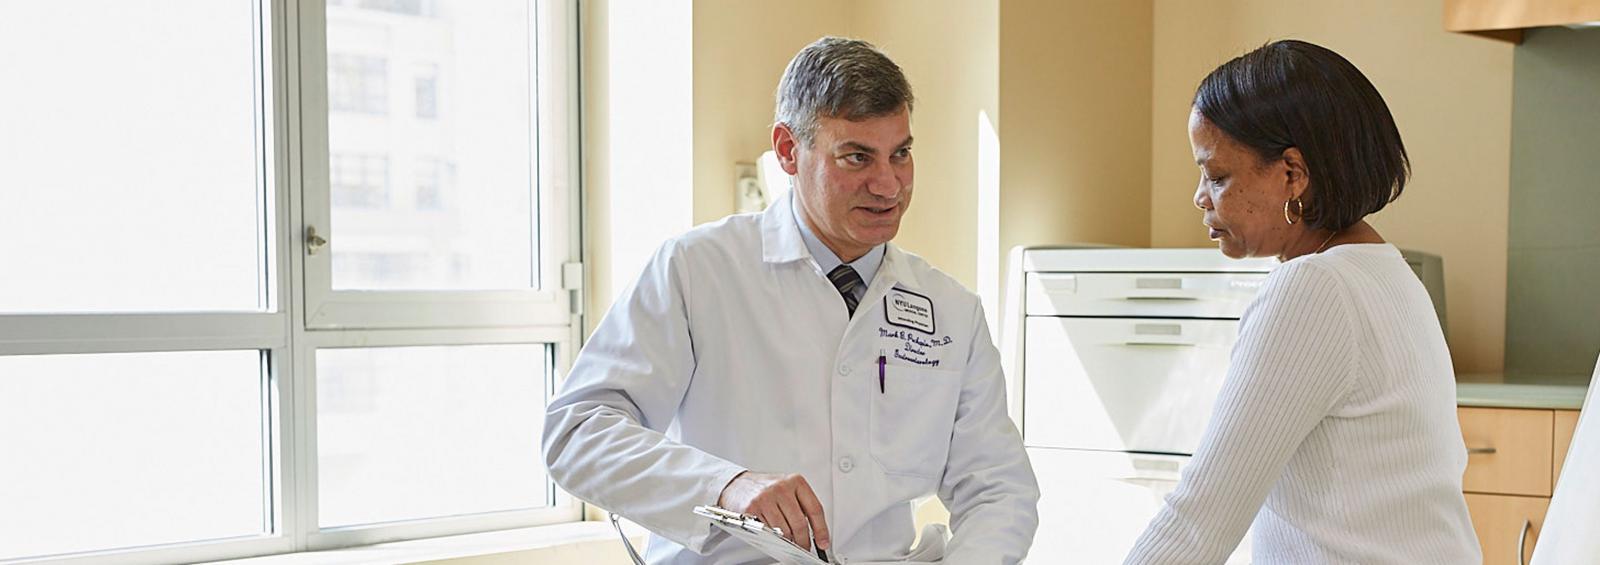 Division of Gastroenterology & Hepatology Leadership | NYU